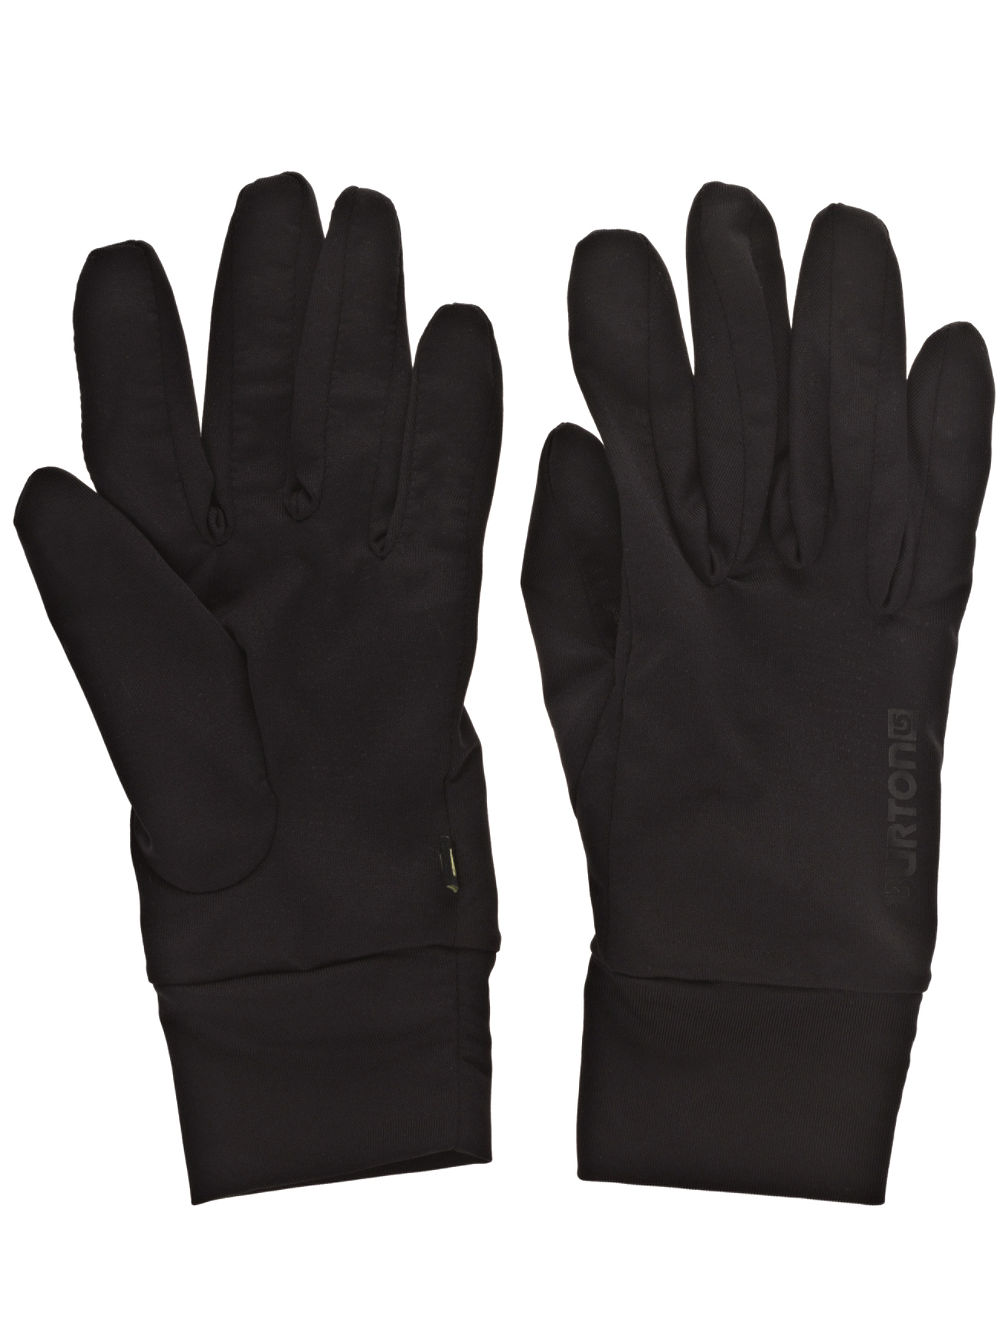 560e9a5d1 Buy Burton Touchscreen Liner Gloves online at Blue Tomato